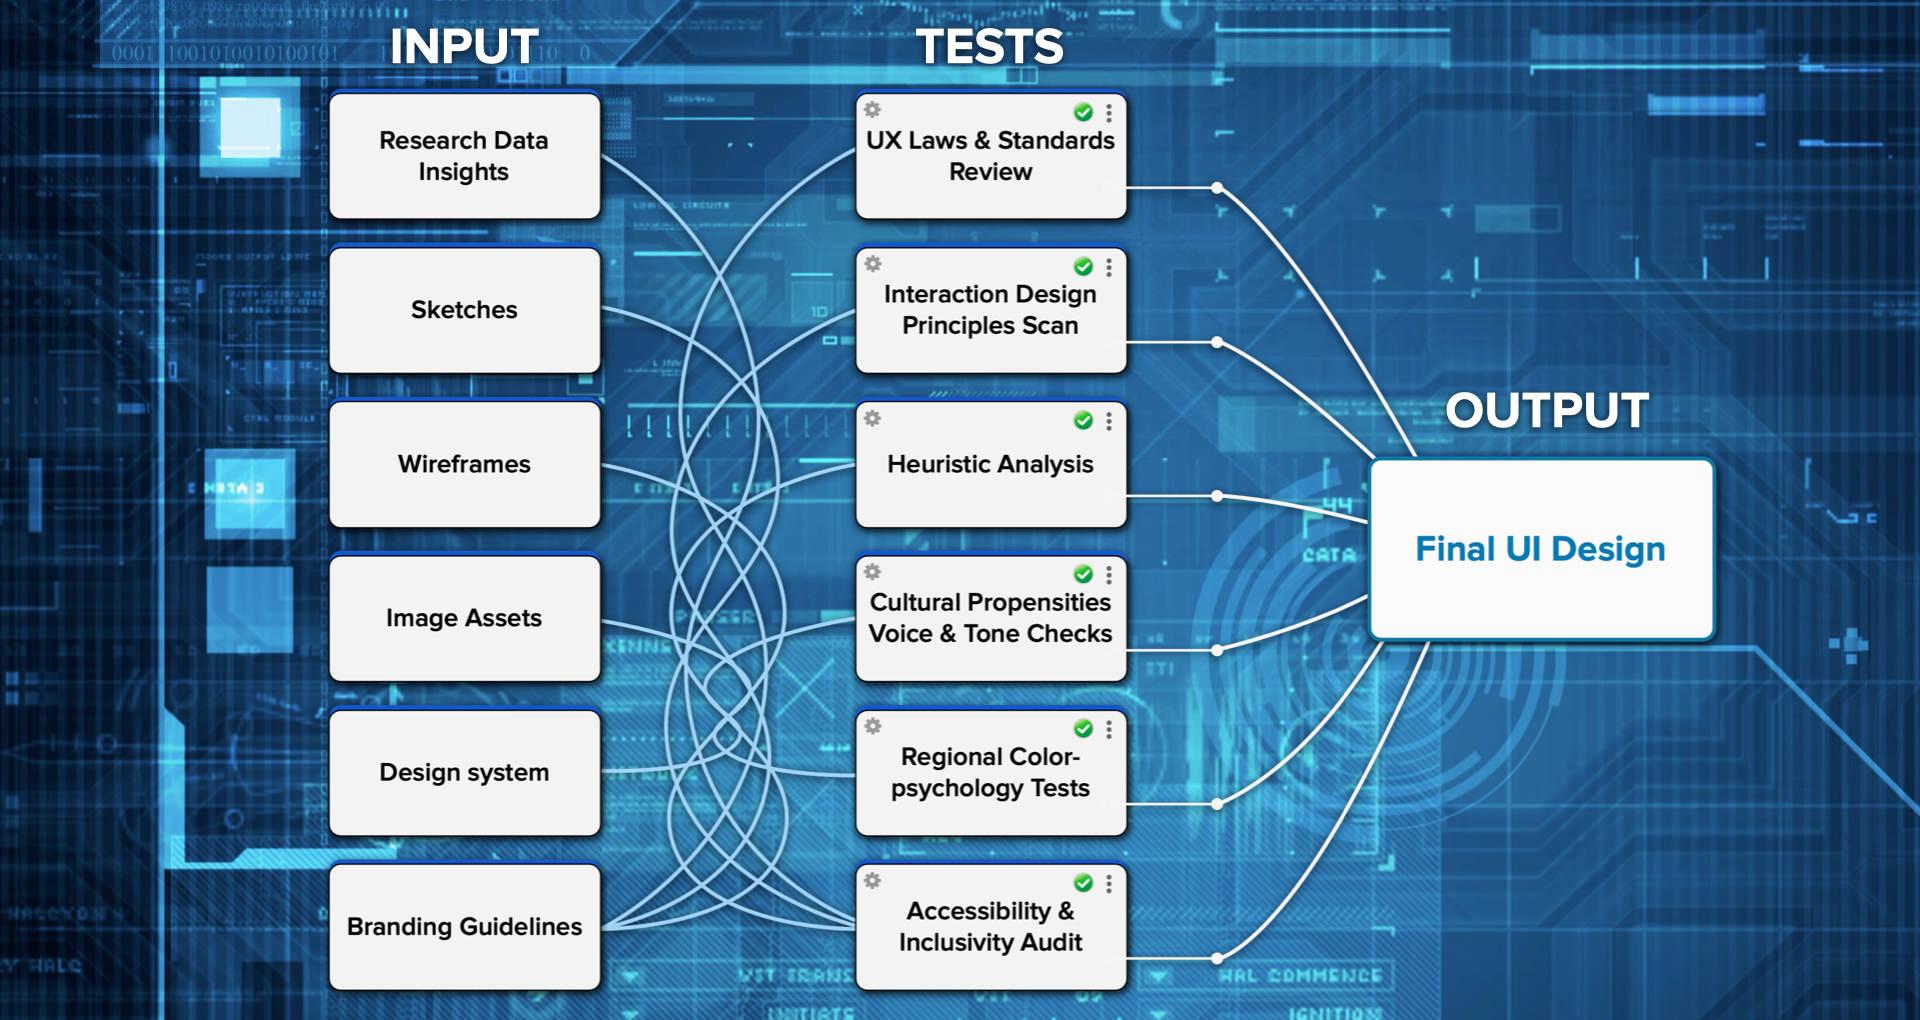 Future design workflow, an AI-augmented design process